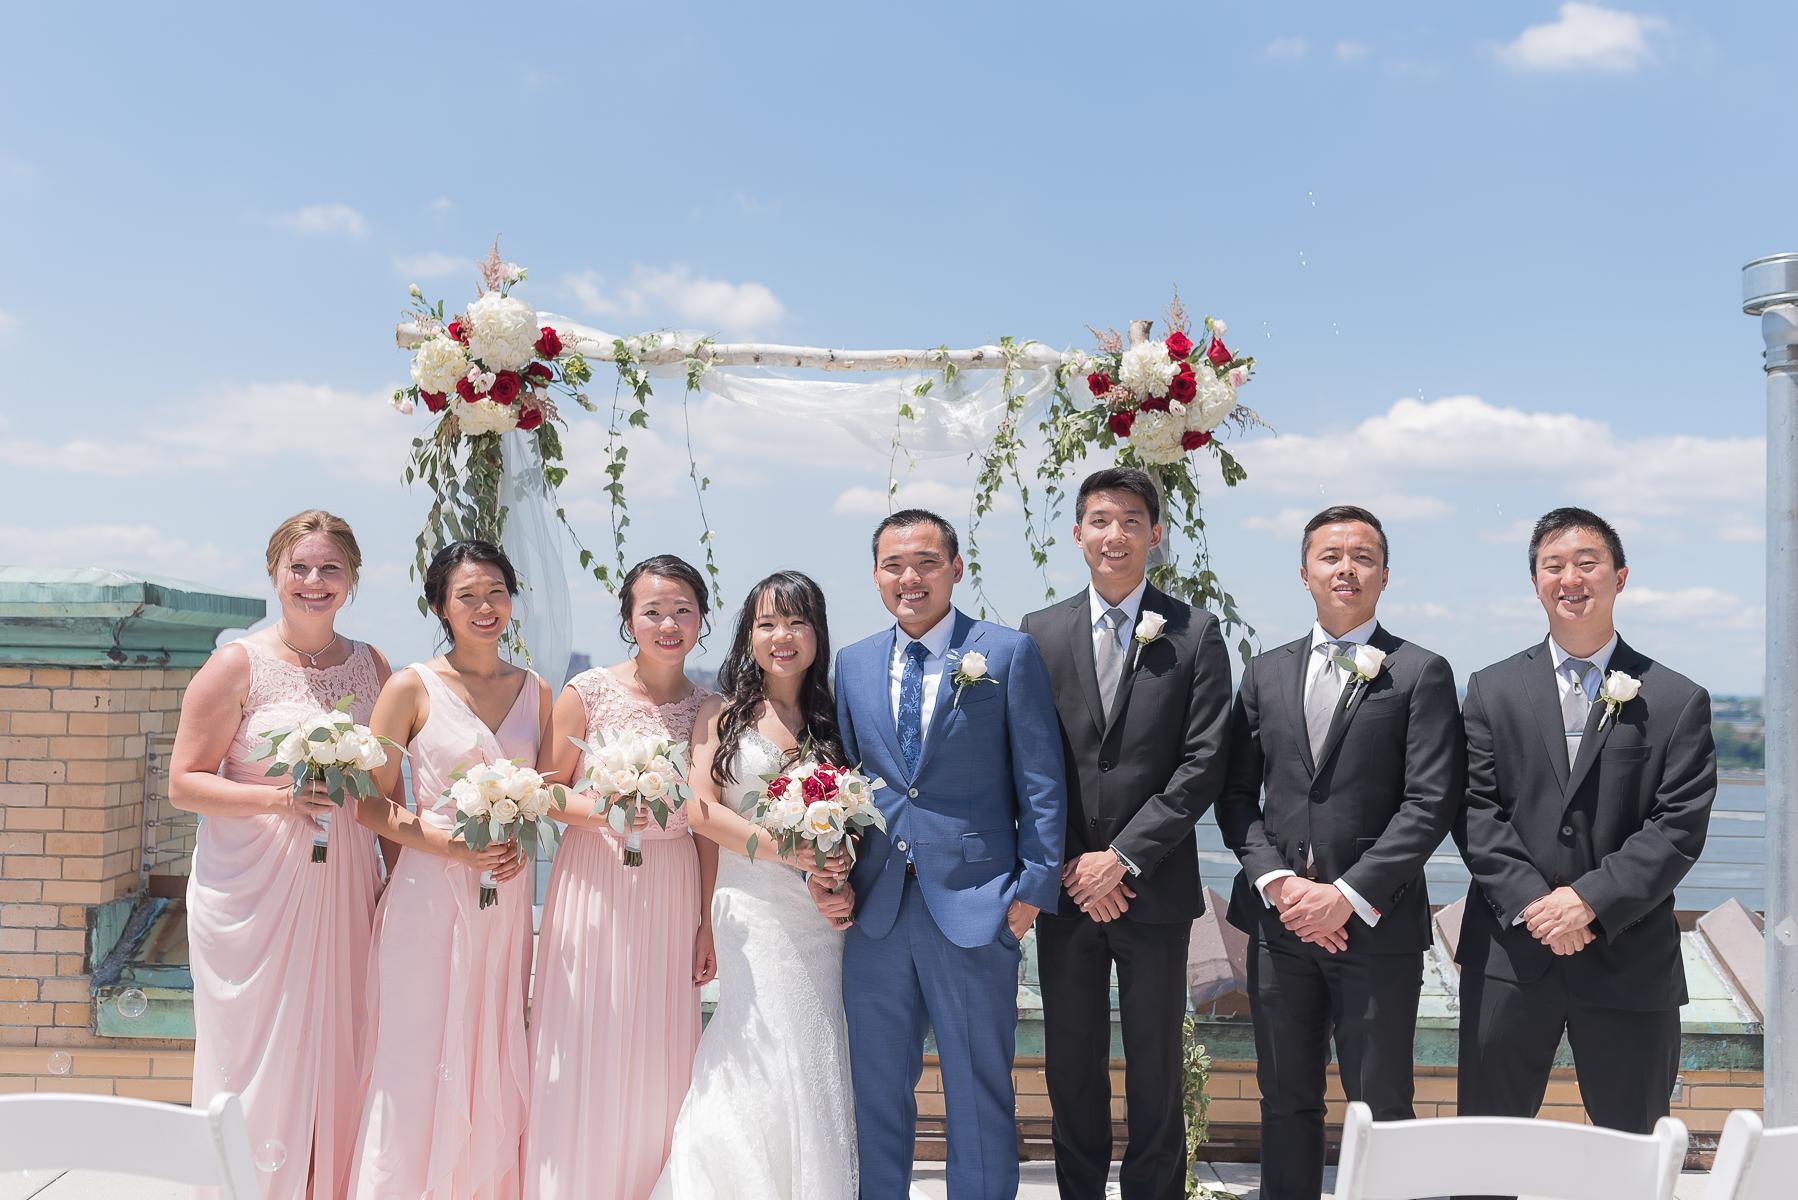 NYC-Ramscale-Wedding-Ceremony-Wedding-Party2.jpg